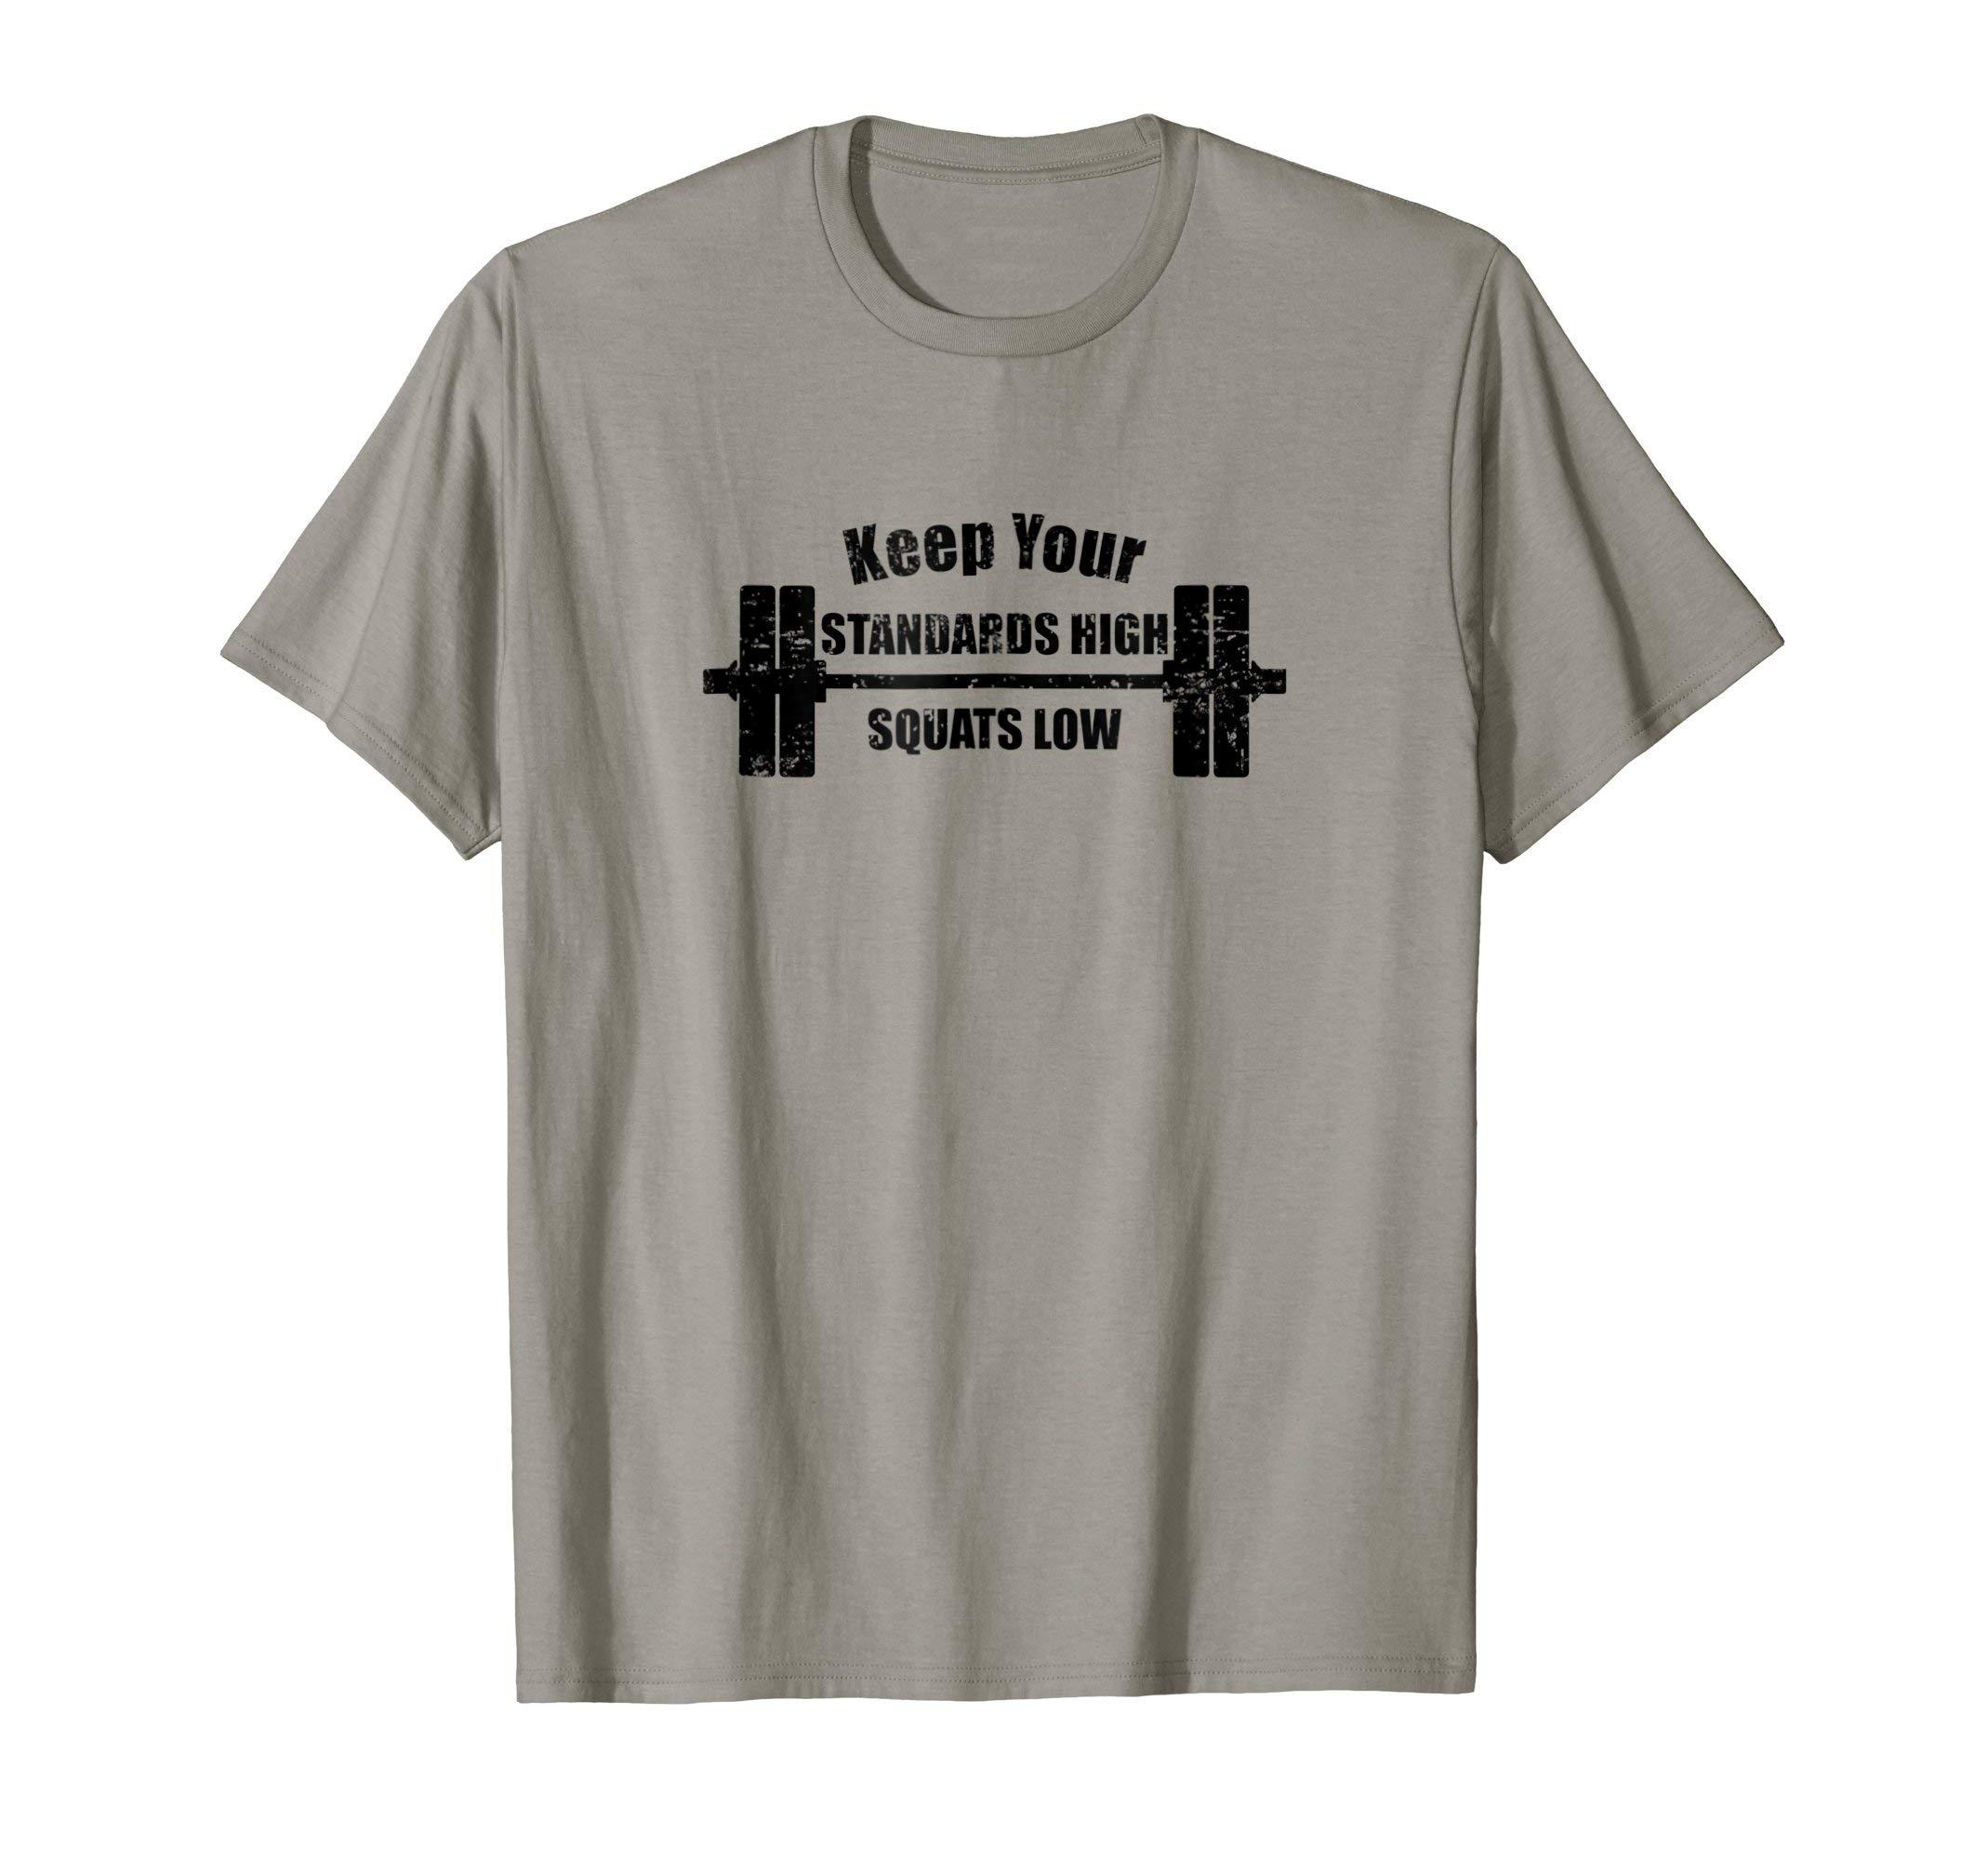 3b087ec142ec0 Keep Your Standards High Squats Low T Shirt Fitness Gym Lift